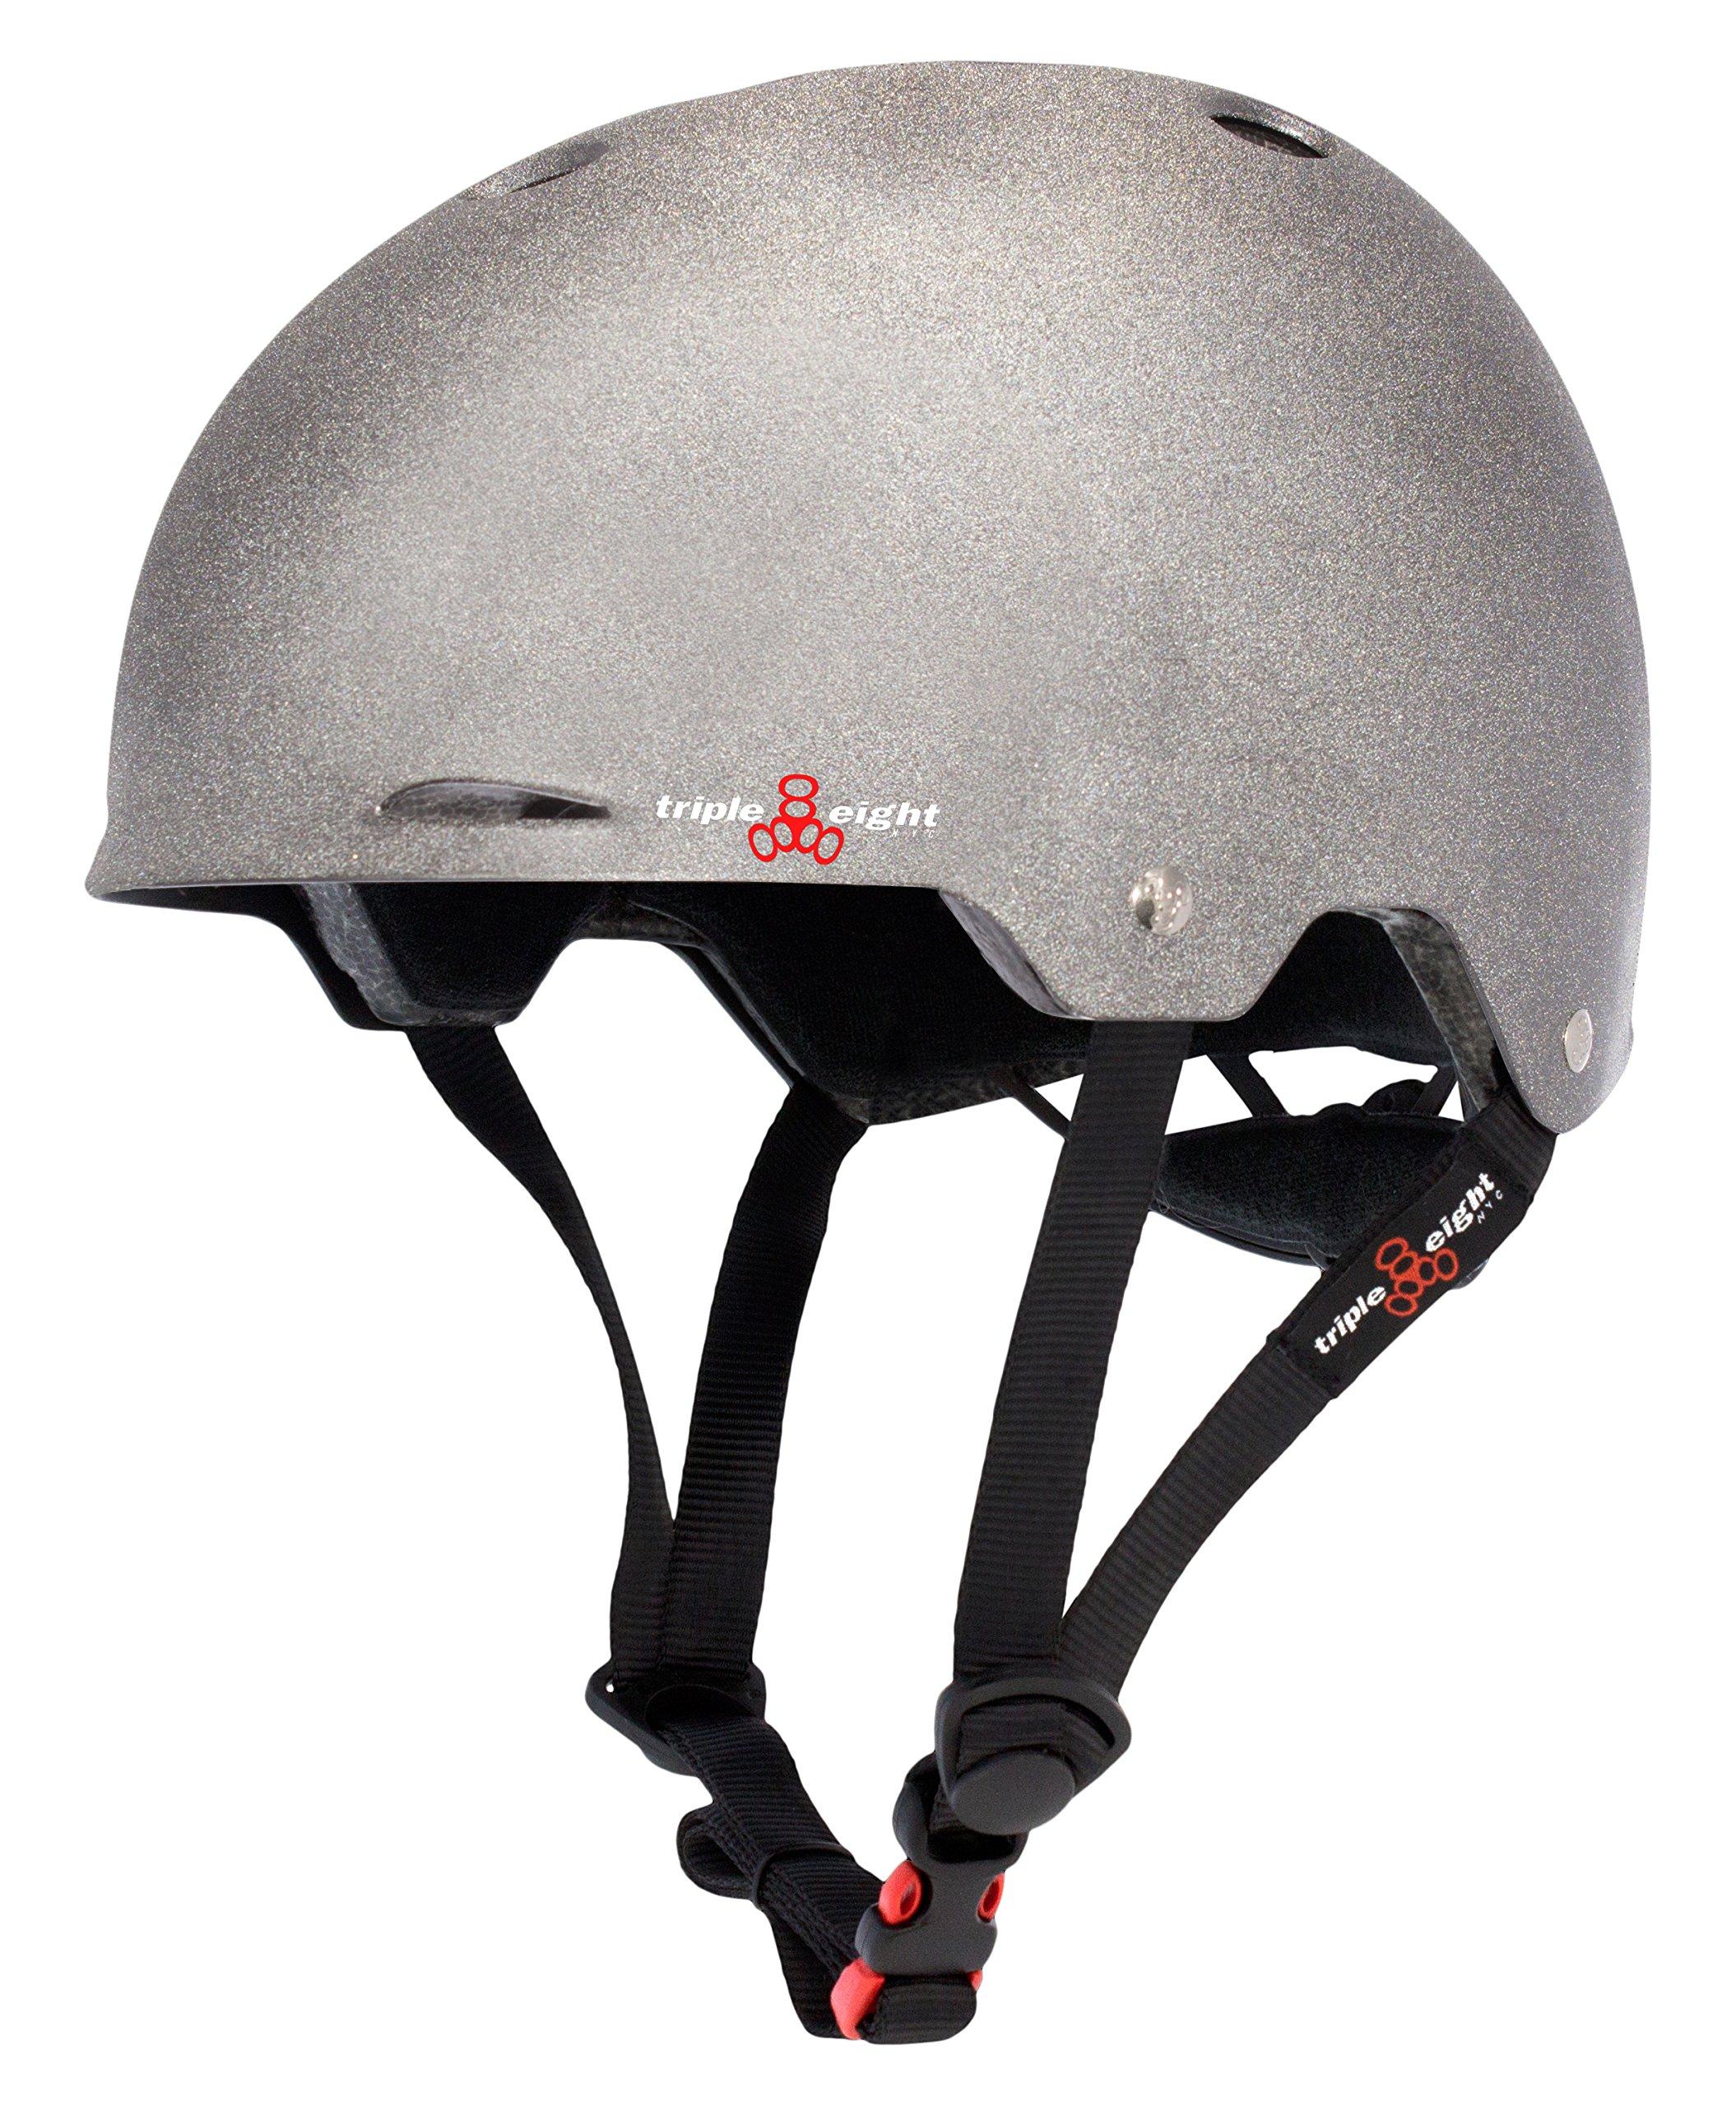 Triple Eight Gotham Helmet, Reflective Darklight, Small/Medium